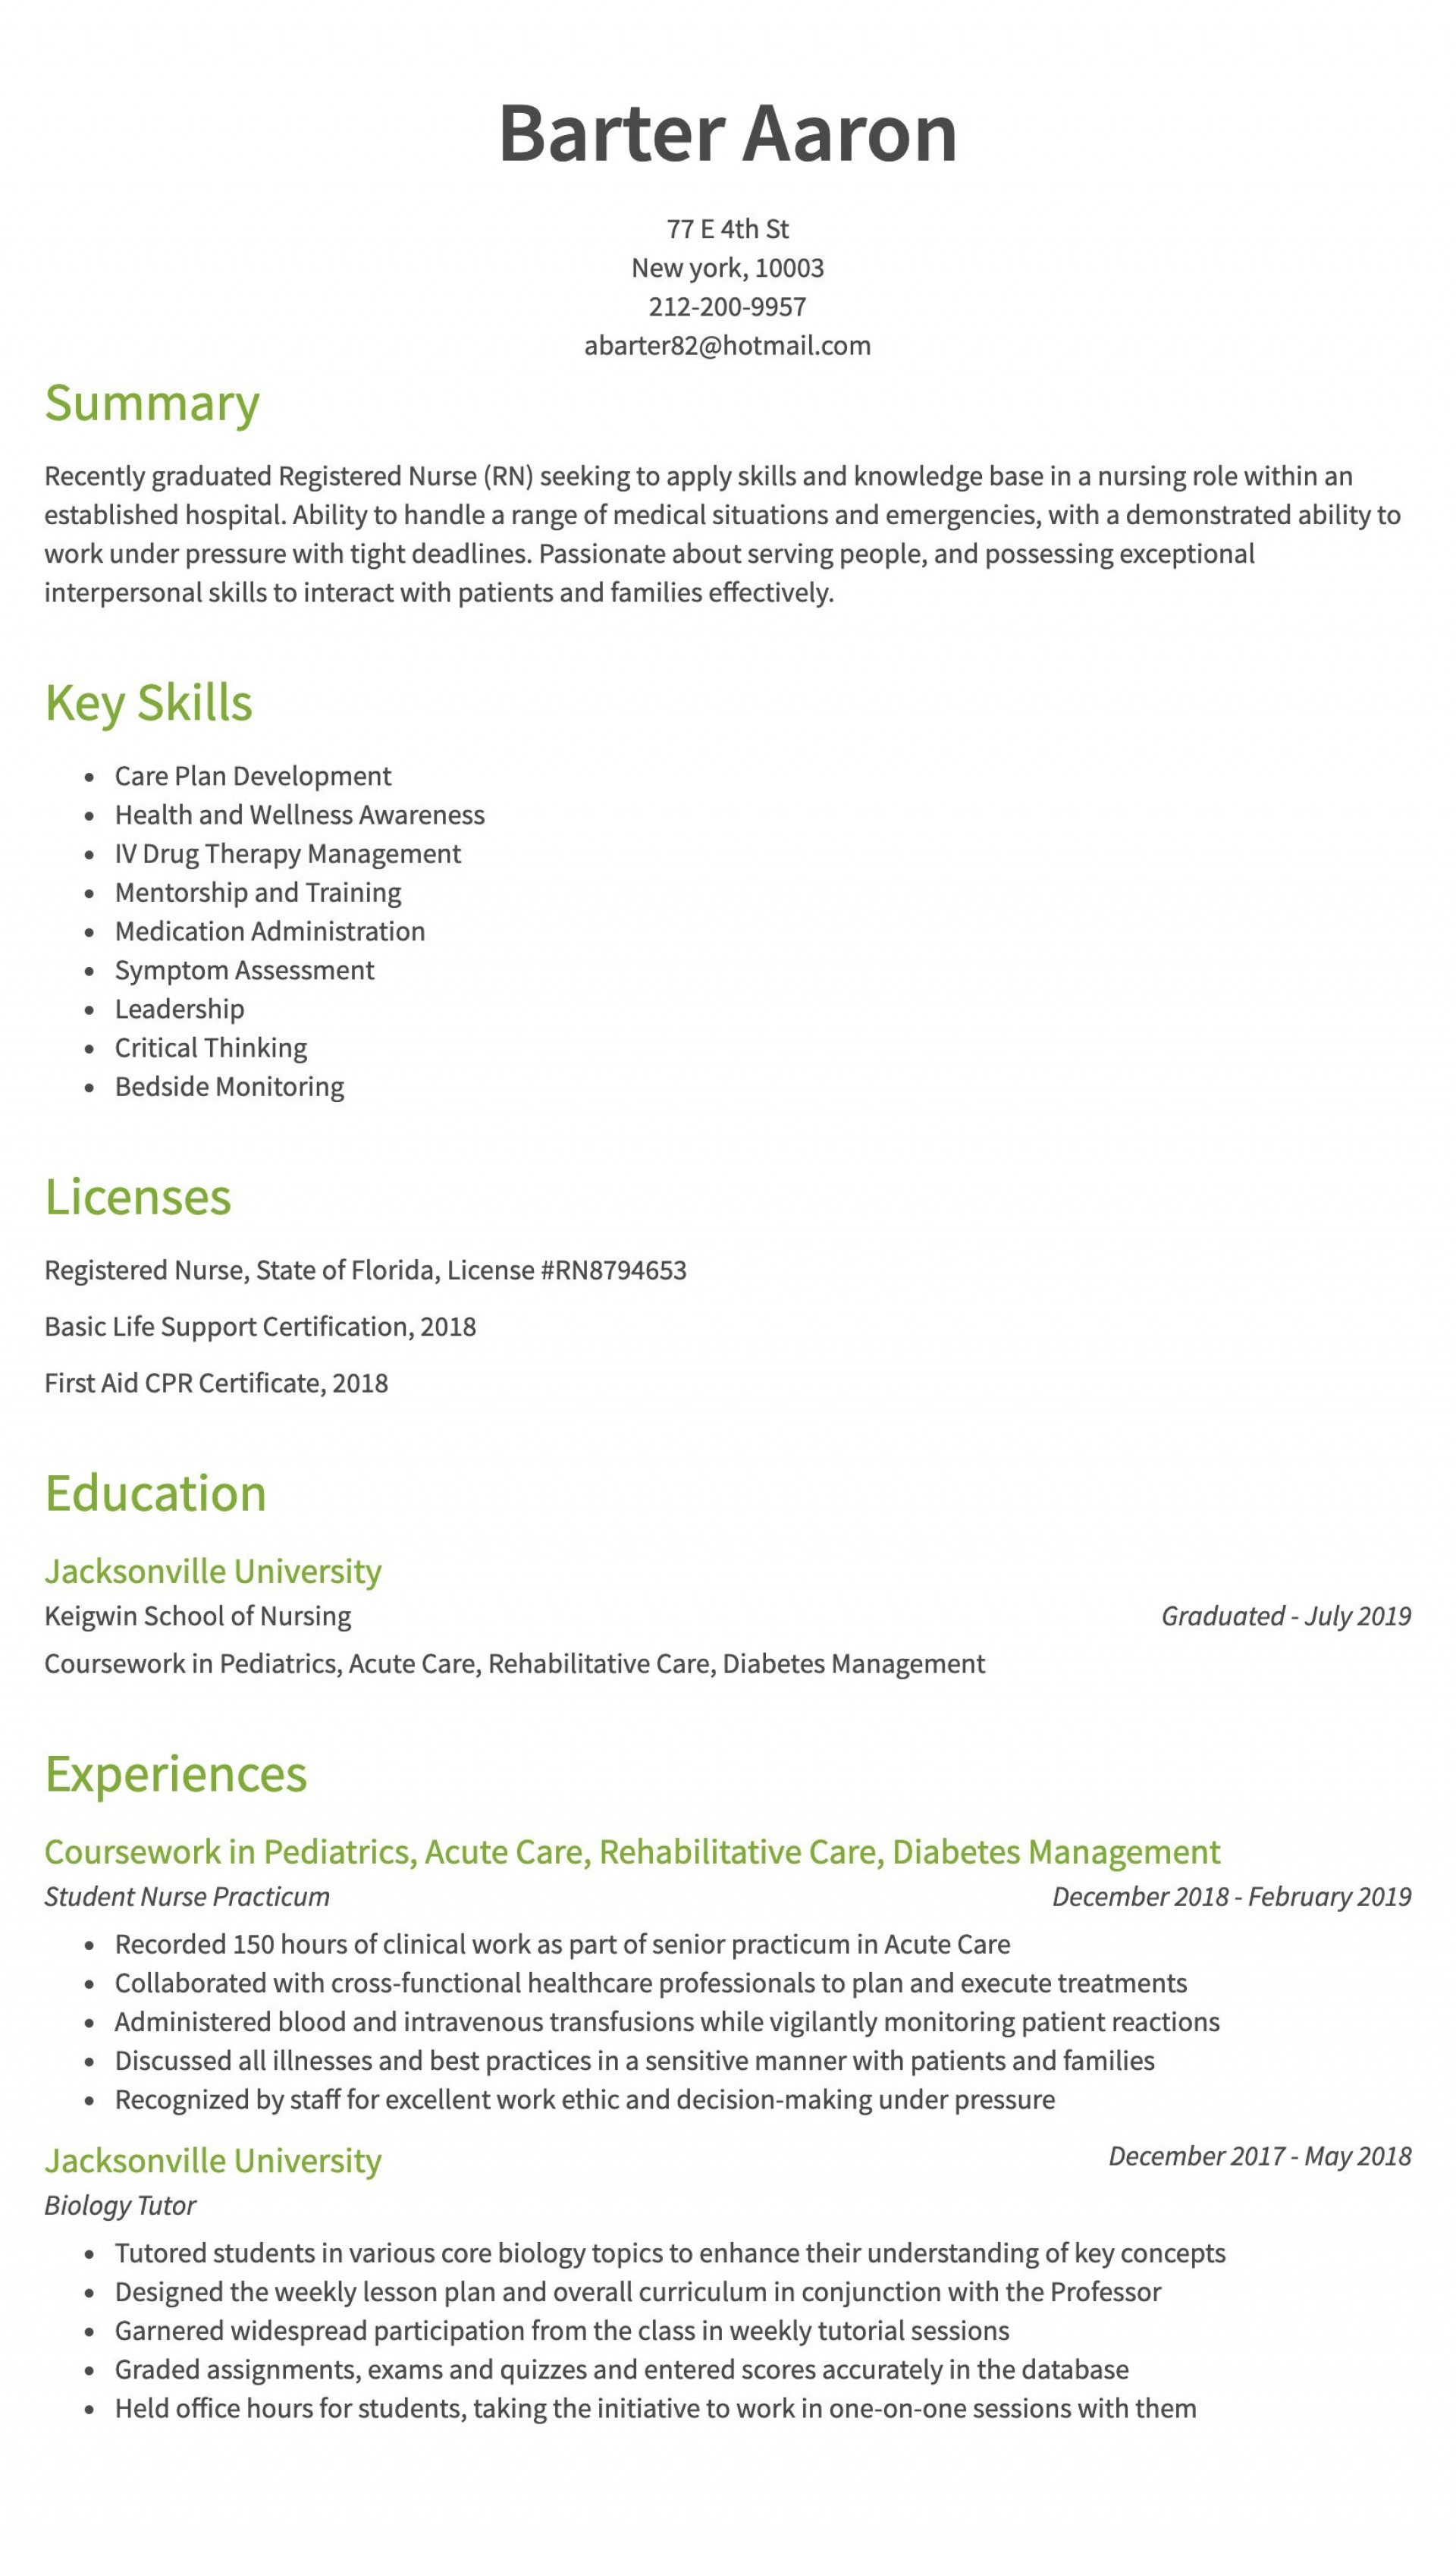 007 Striking Rn Graduate Resume Template High Resolution  New Grad Nurse1920